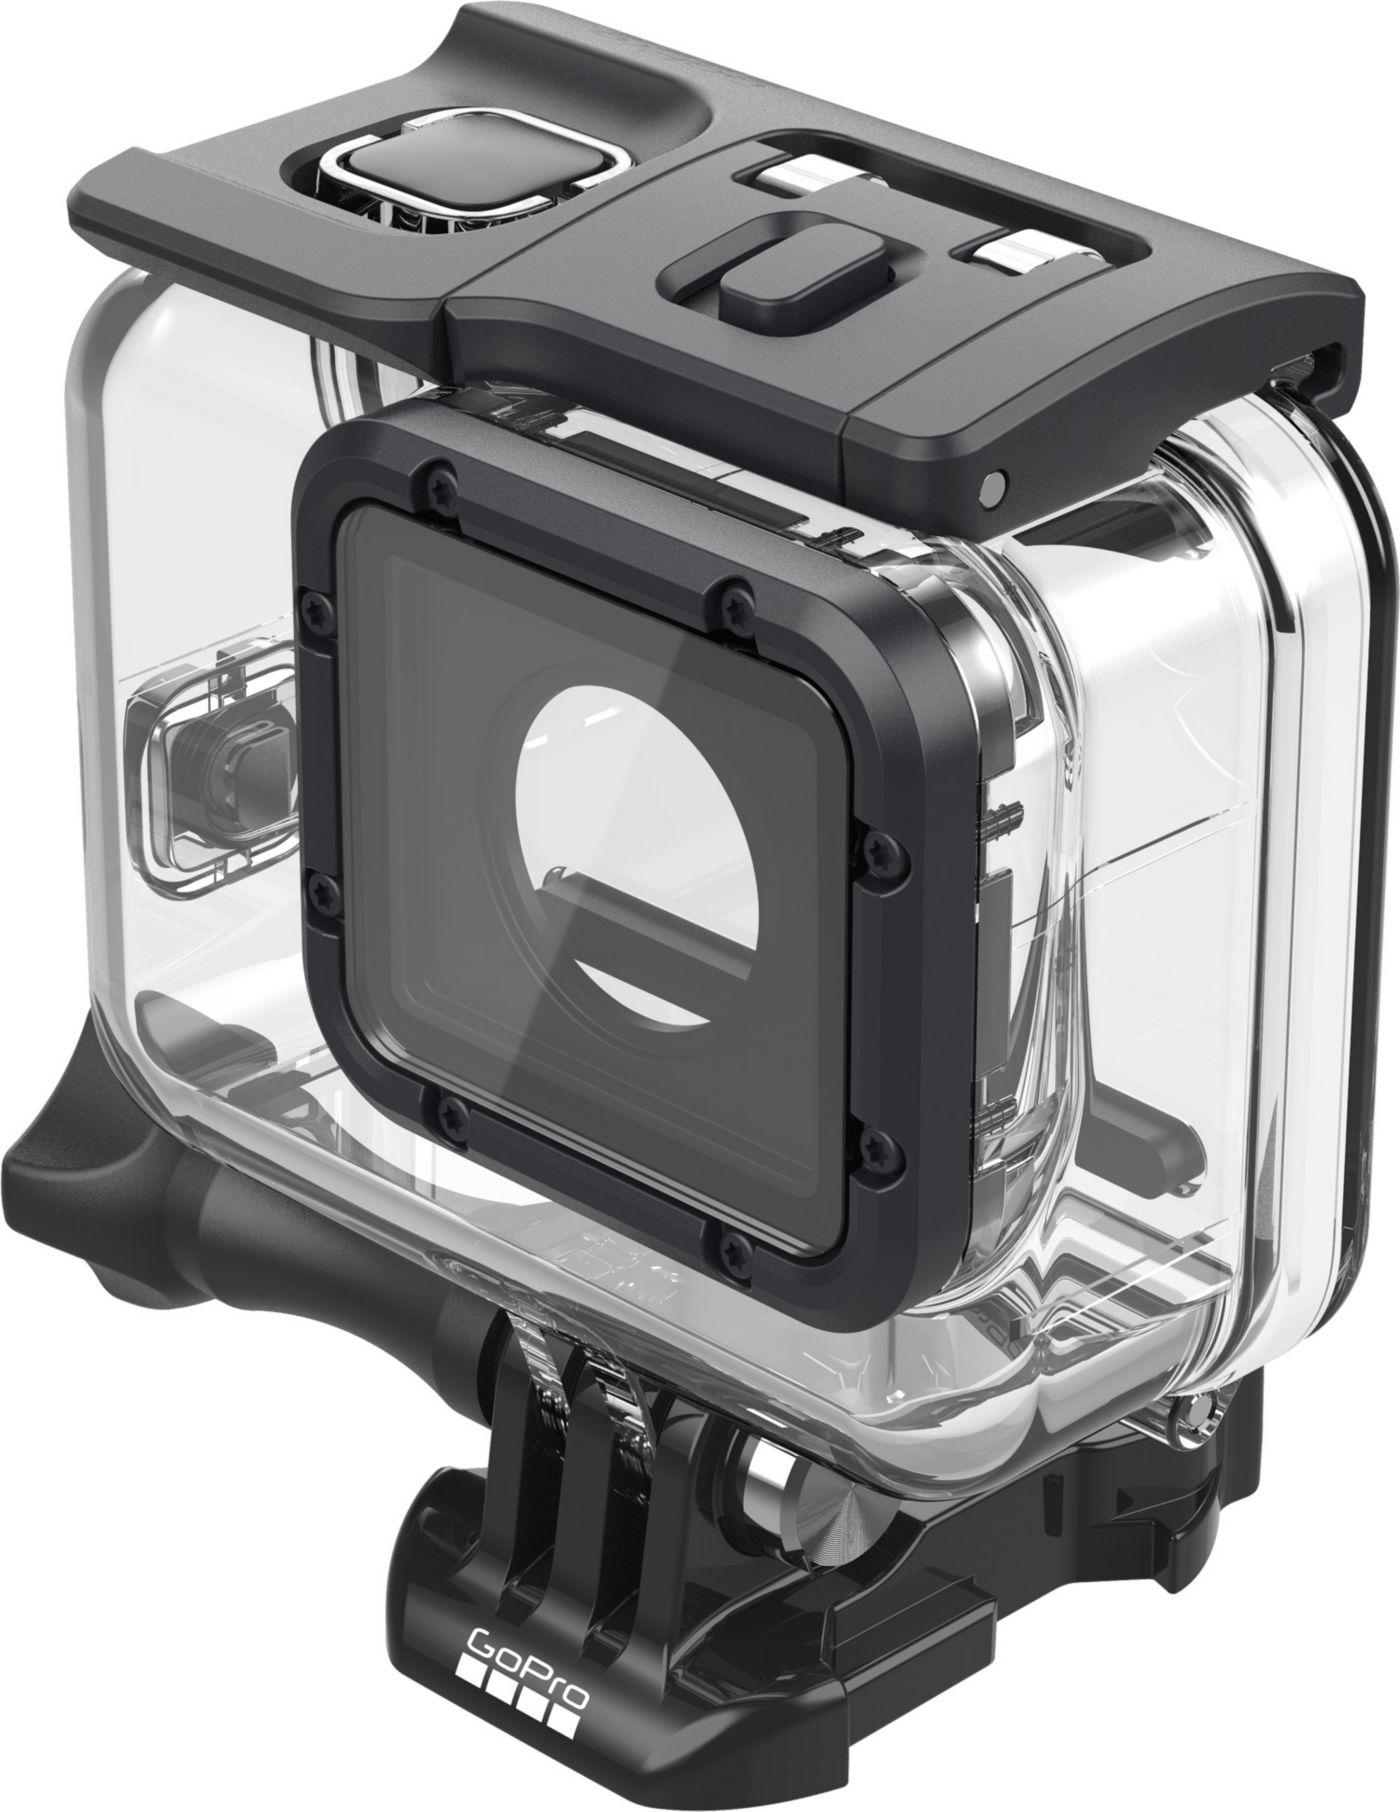 GoPro Super Suit Uber Protection + Dive Housing for HERO5 Black